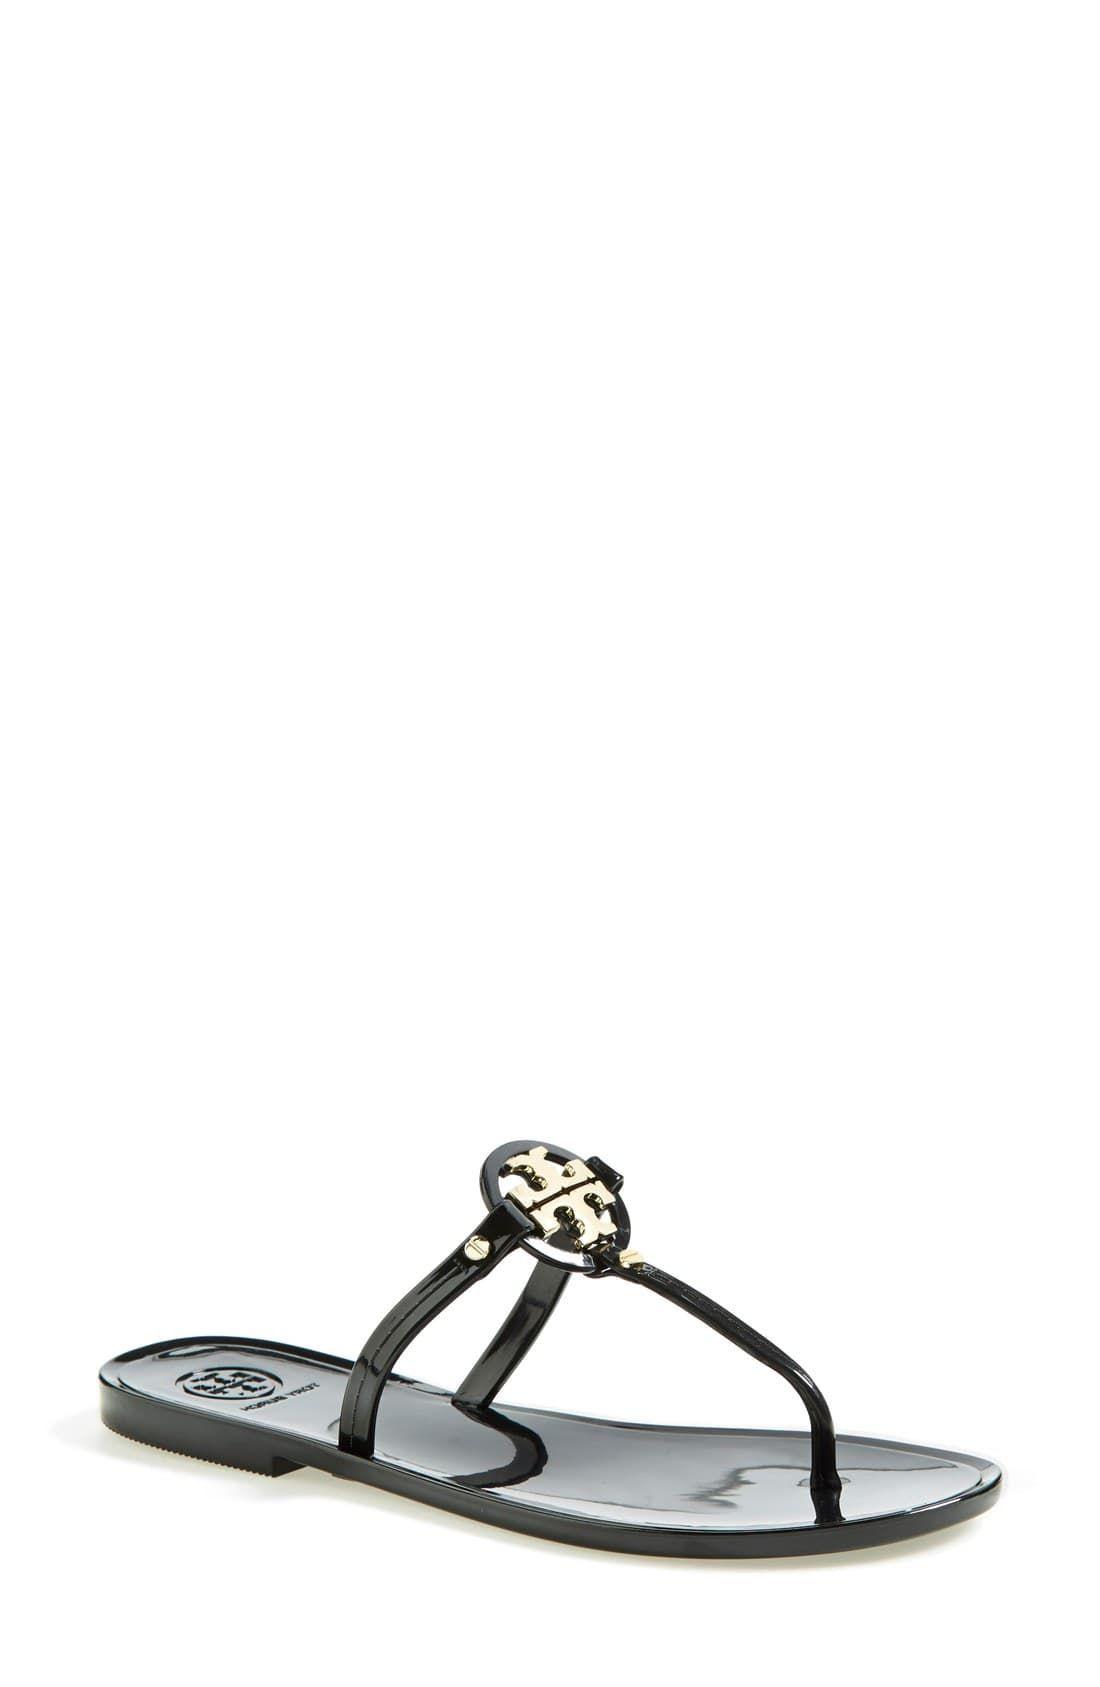 99910697e Women's Tory Burch 'Mini Miller' Flat Sandal, Size 5 M - Blue/green ...